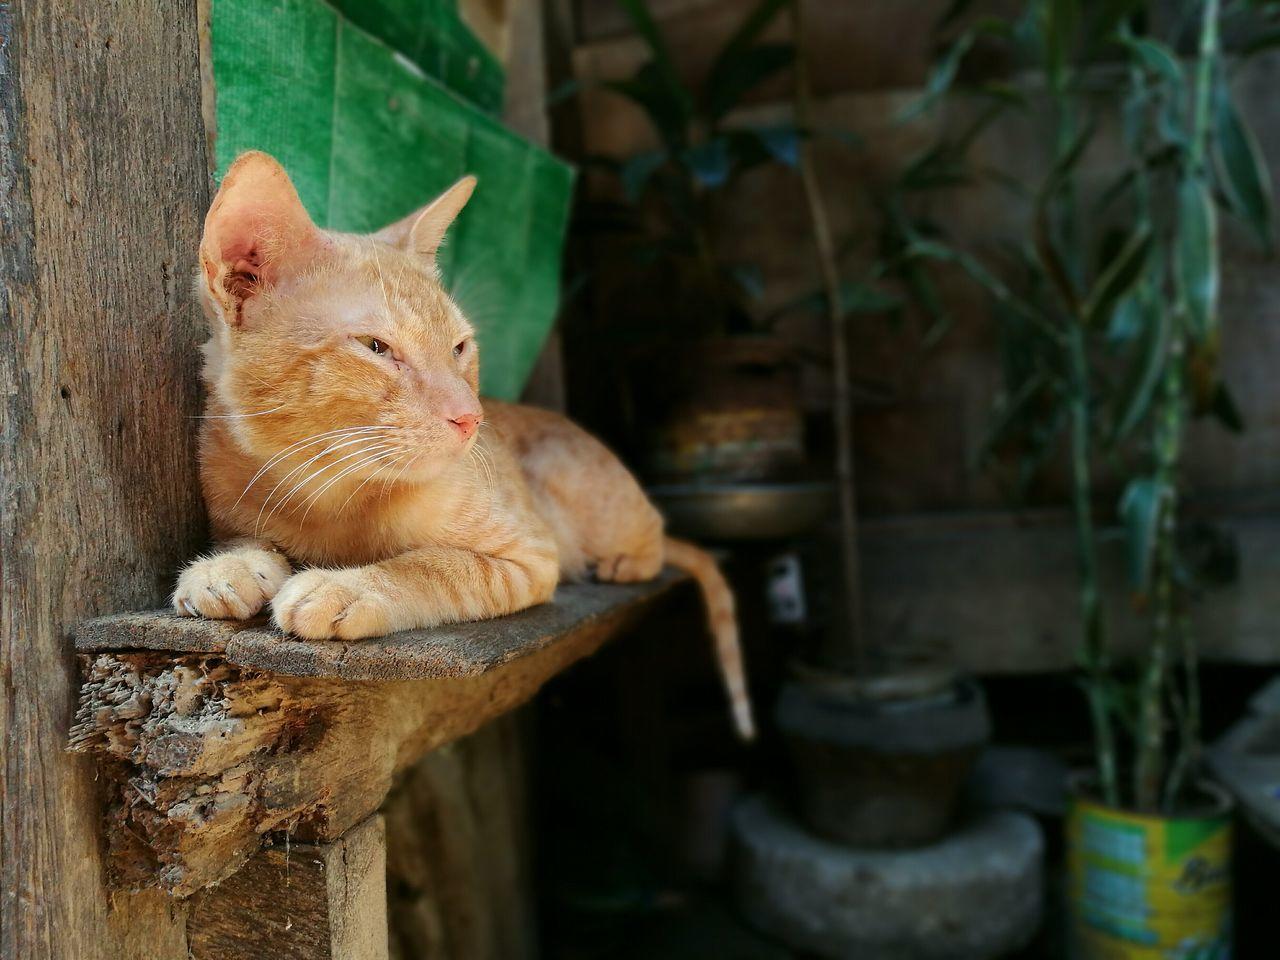 Purrfectmorning Purrfect Cat♡ Cat Lovers 🐱💞 Cats Of EyeEm EyeEm Best Shots EyeEmBestPics EyeEmCatlovers